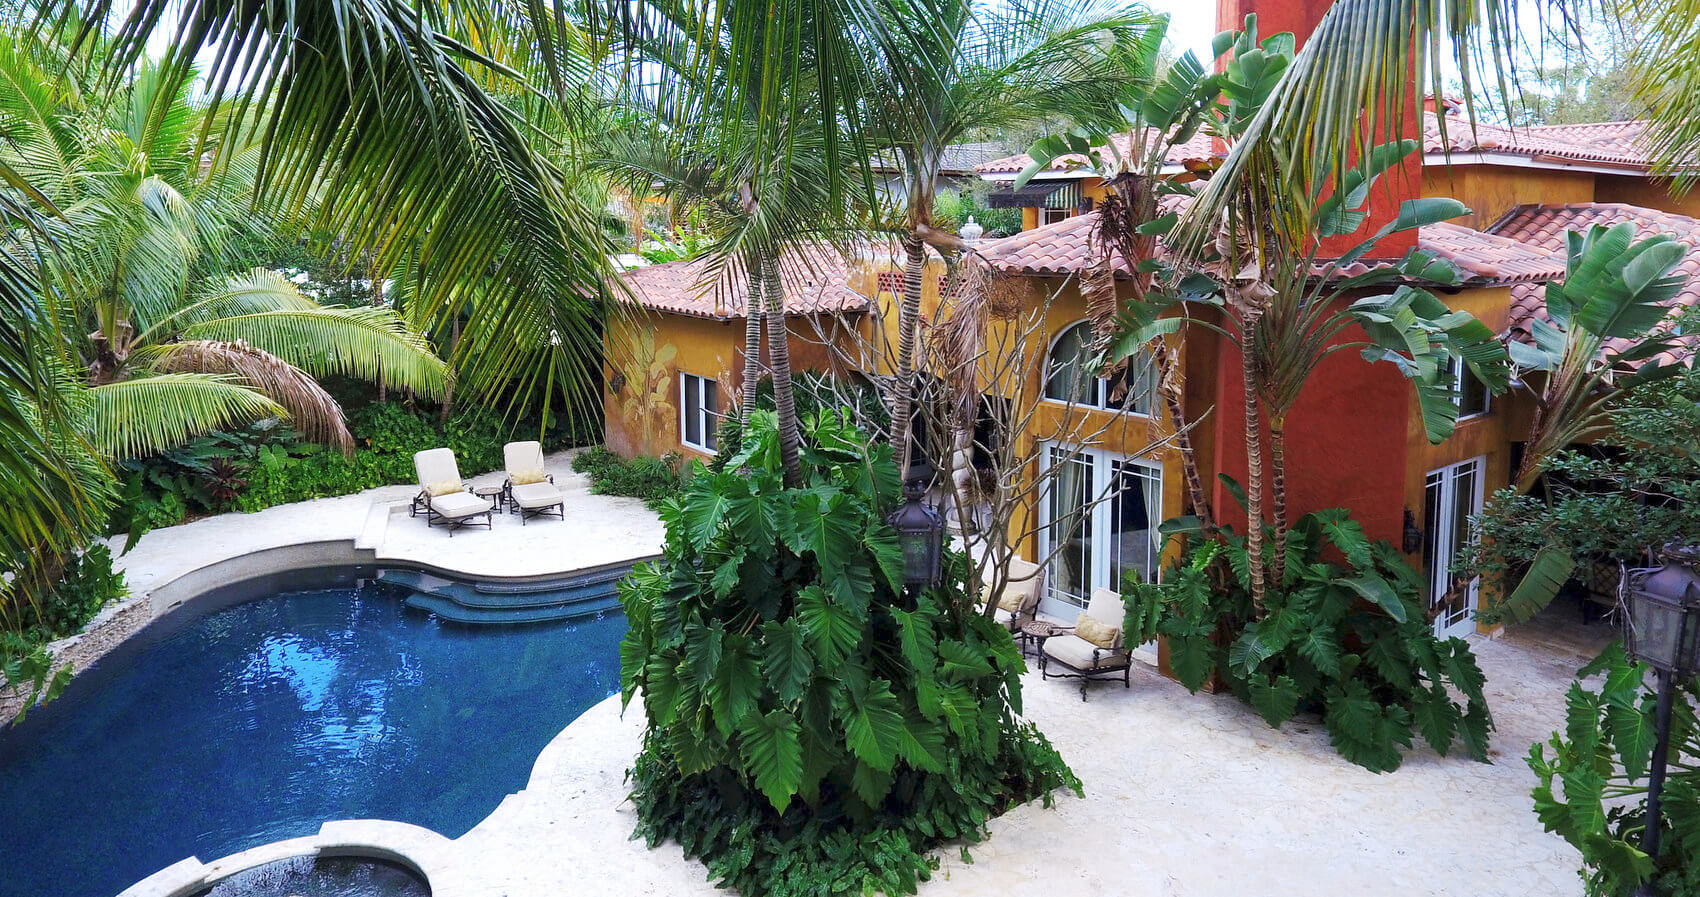 16__coconut_grove_aerial_photo_by_MiamiRealEstatePhotographers.com